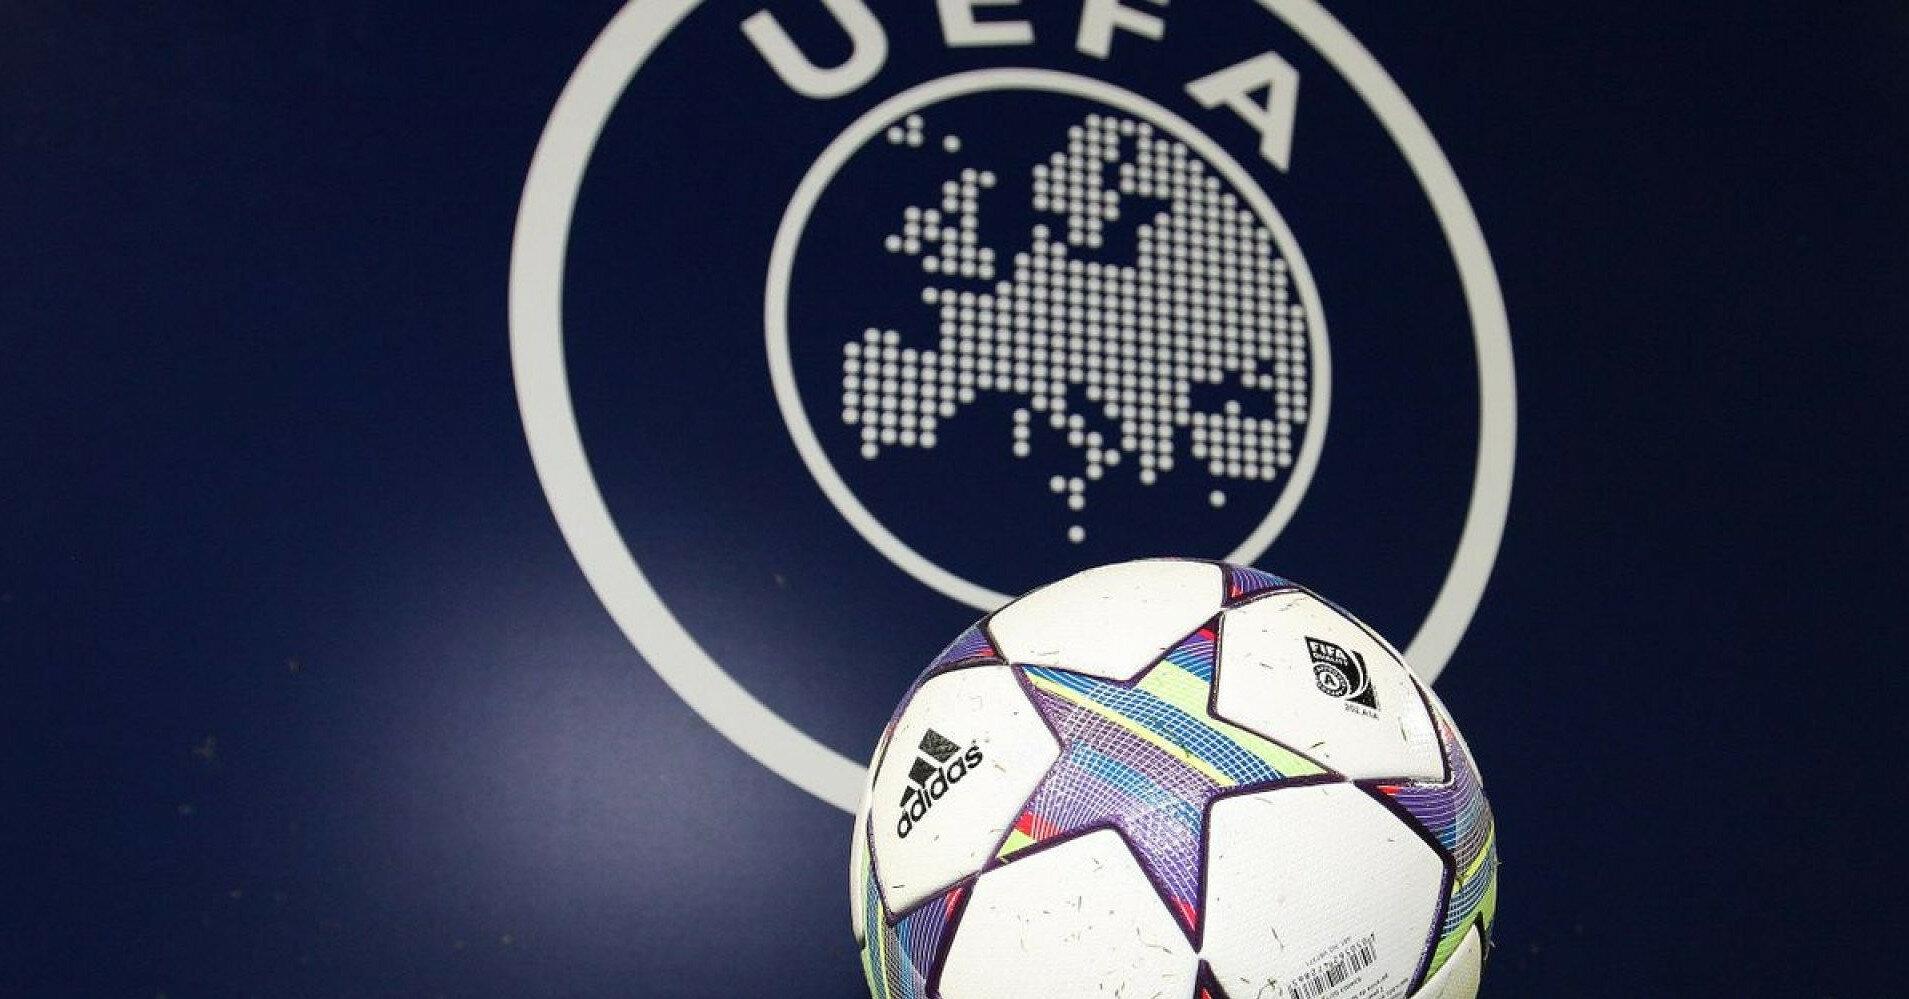 УЕФА завел дело на Англию после финала Евро-2020